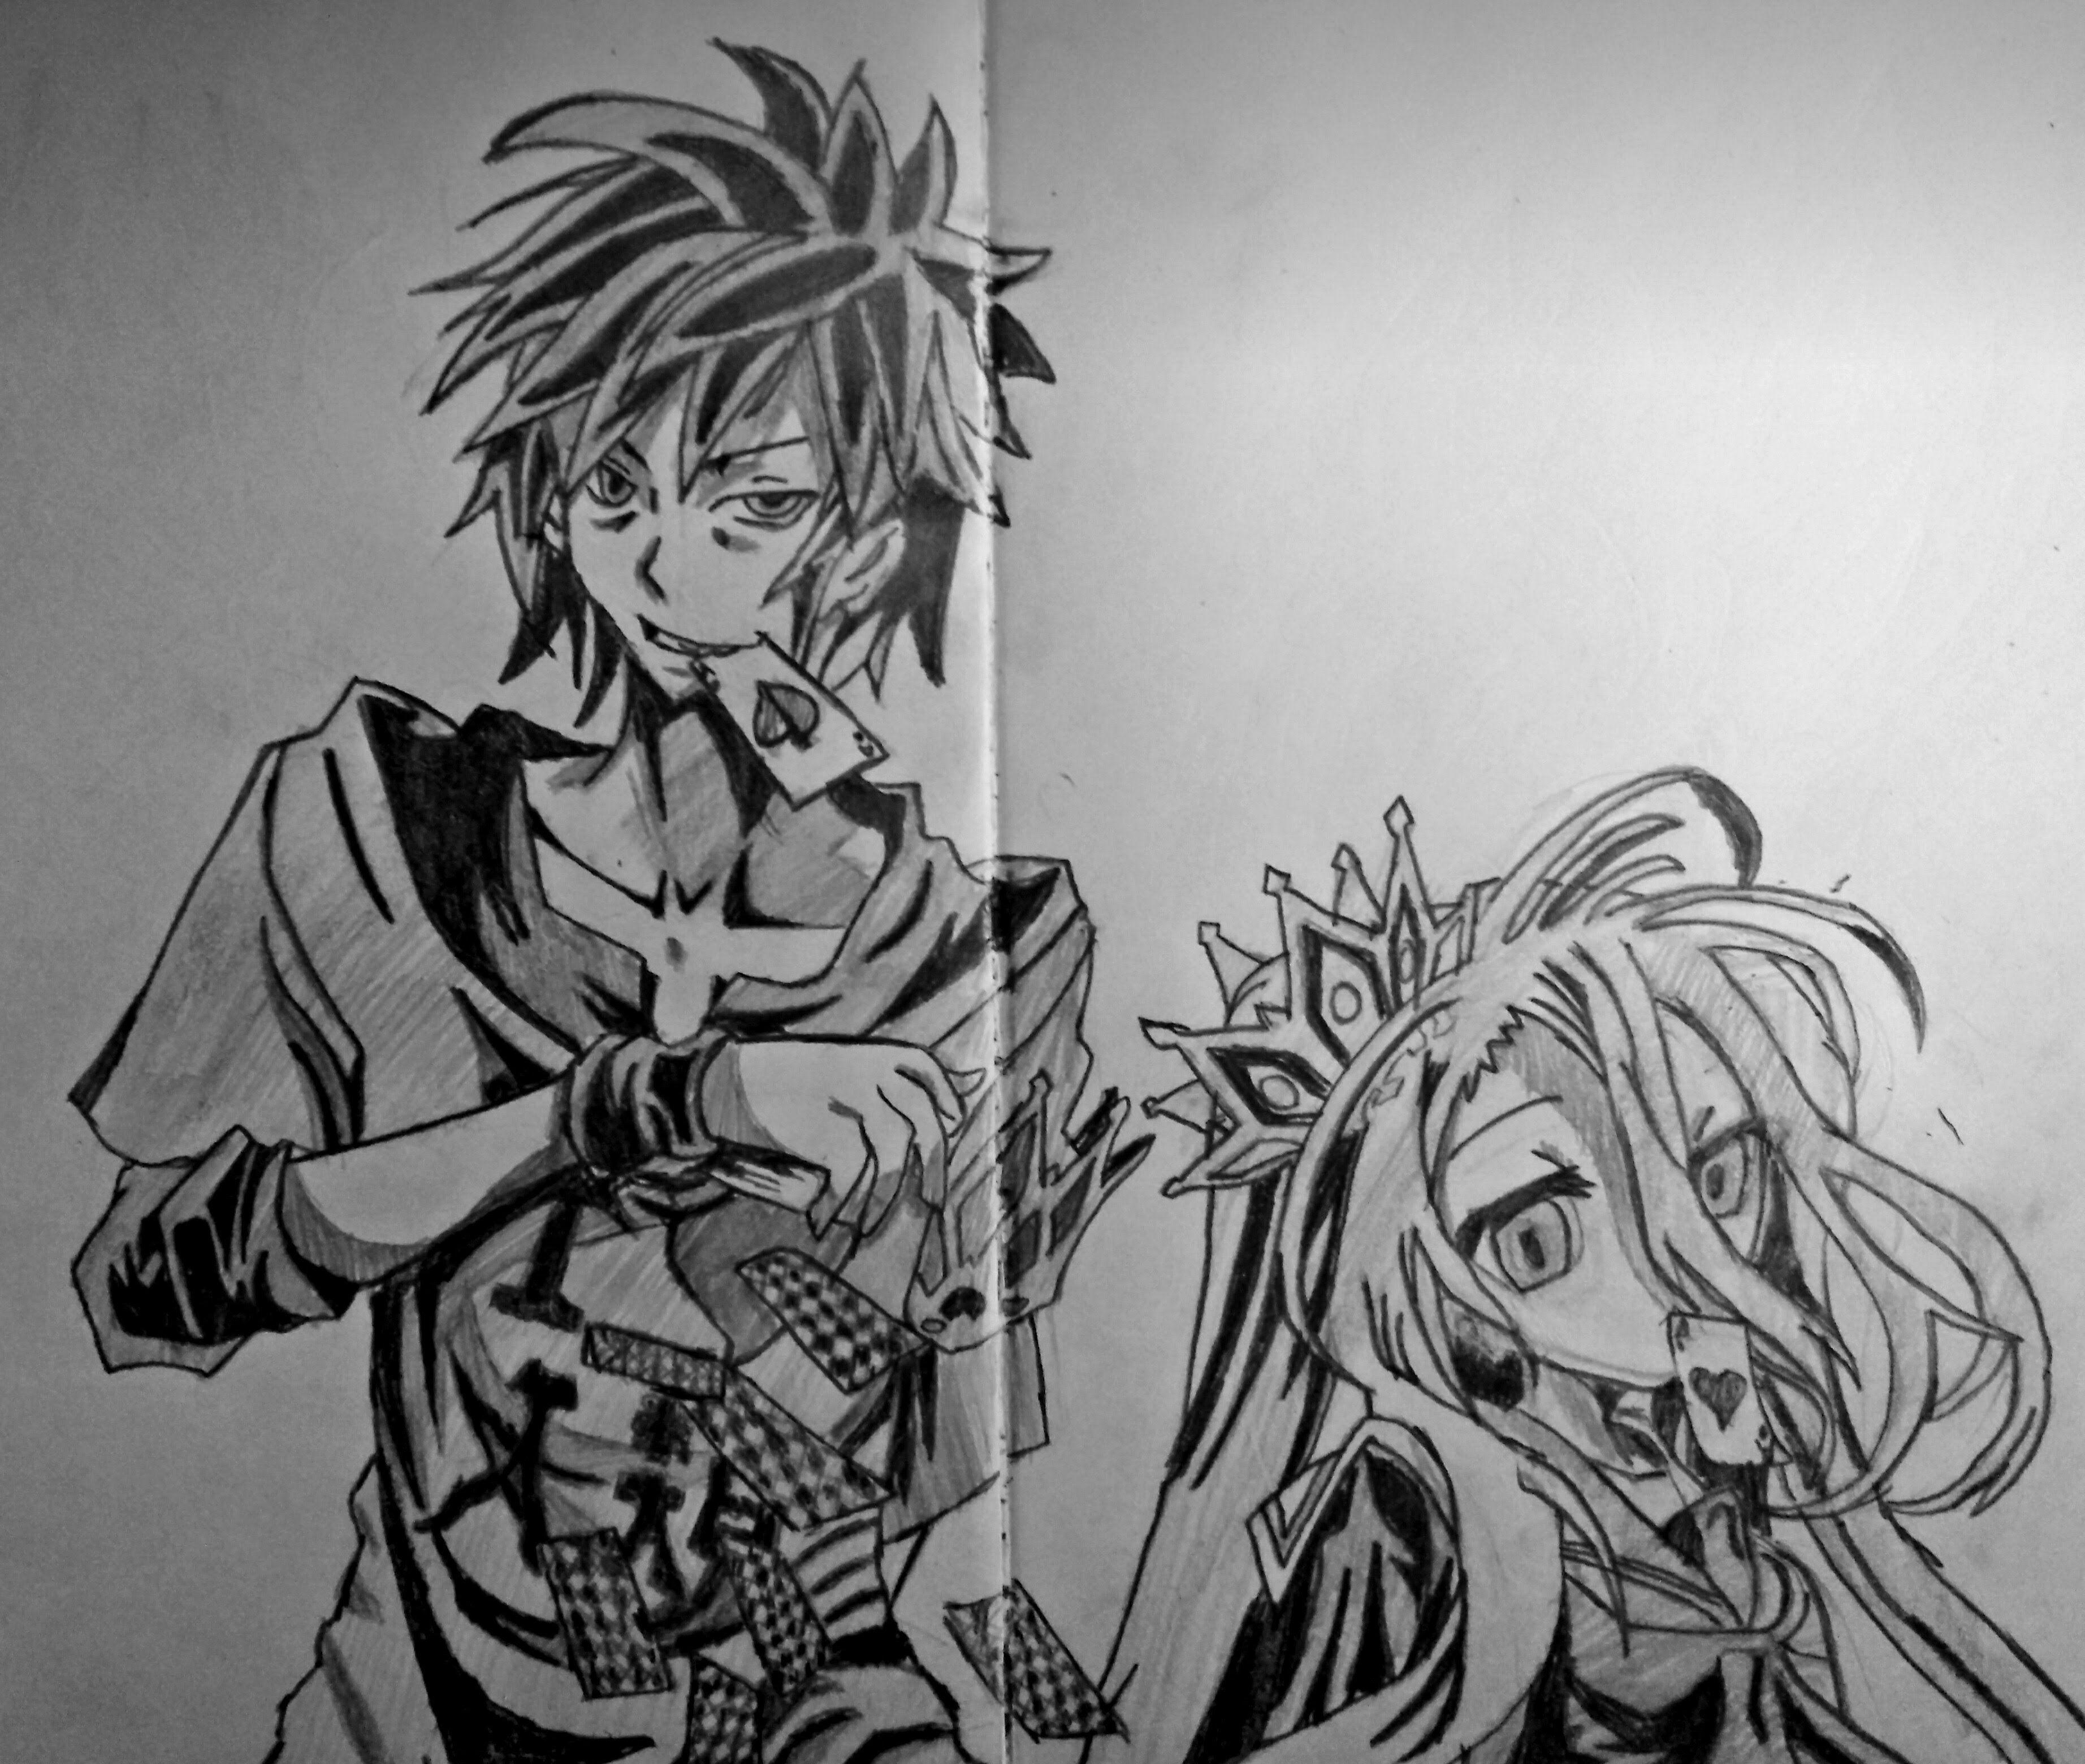 speed drawing anime sora and shiro no game no life